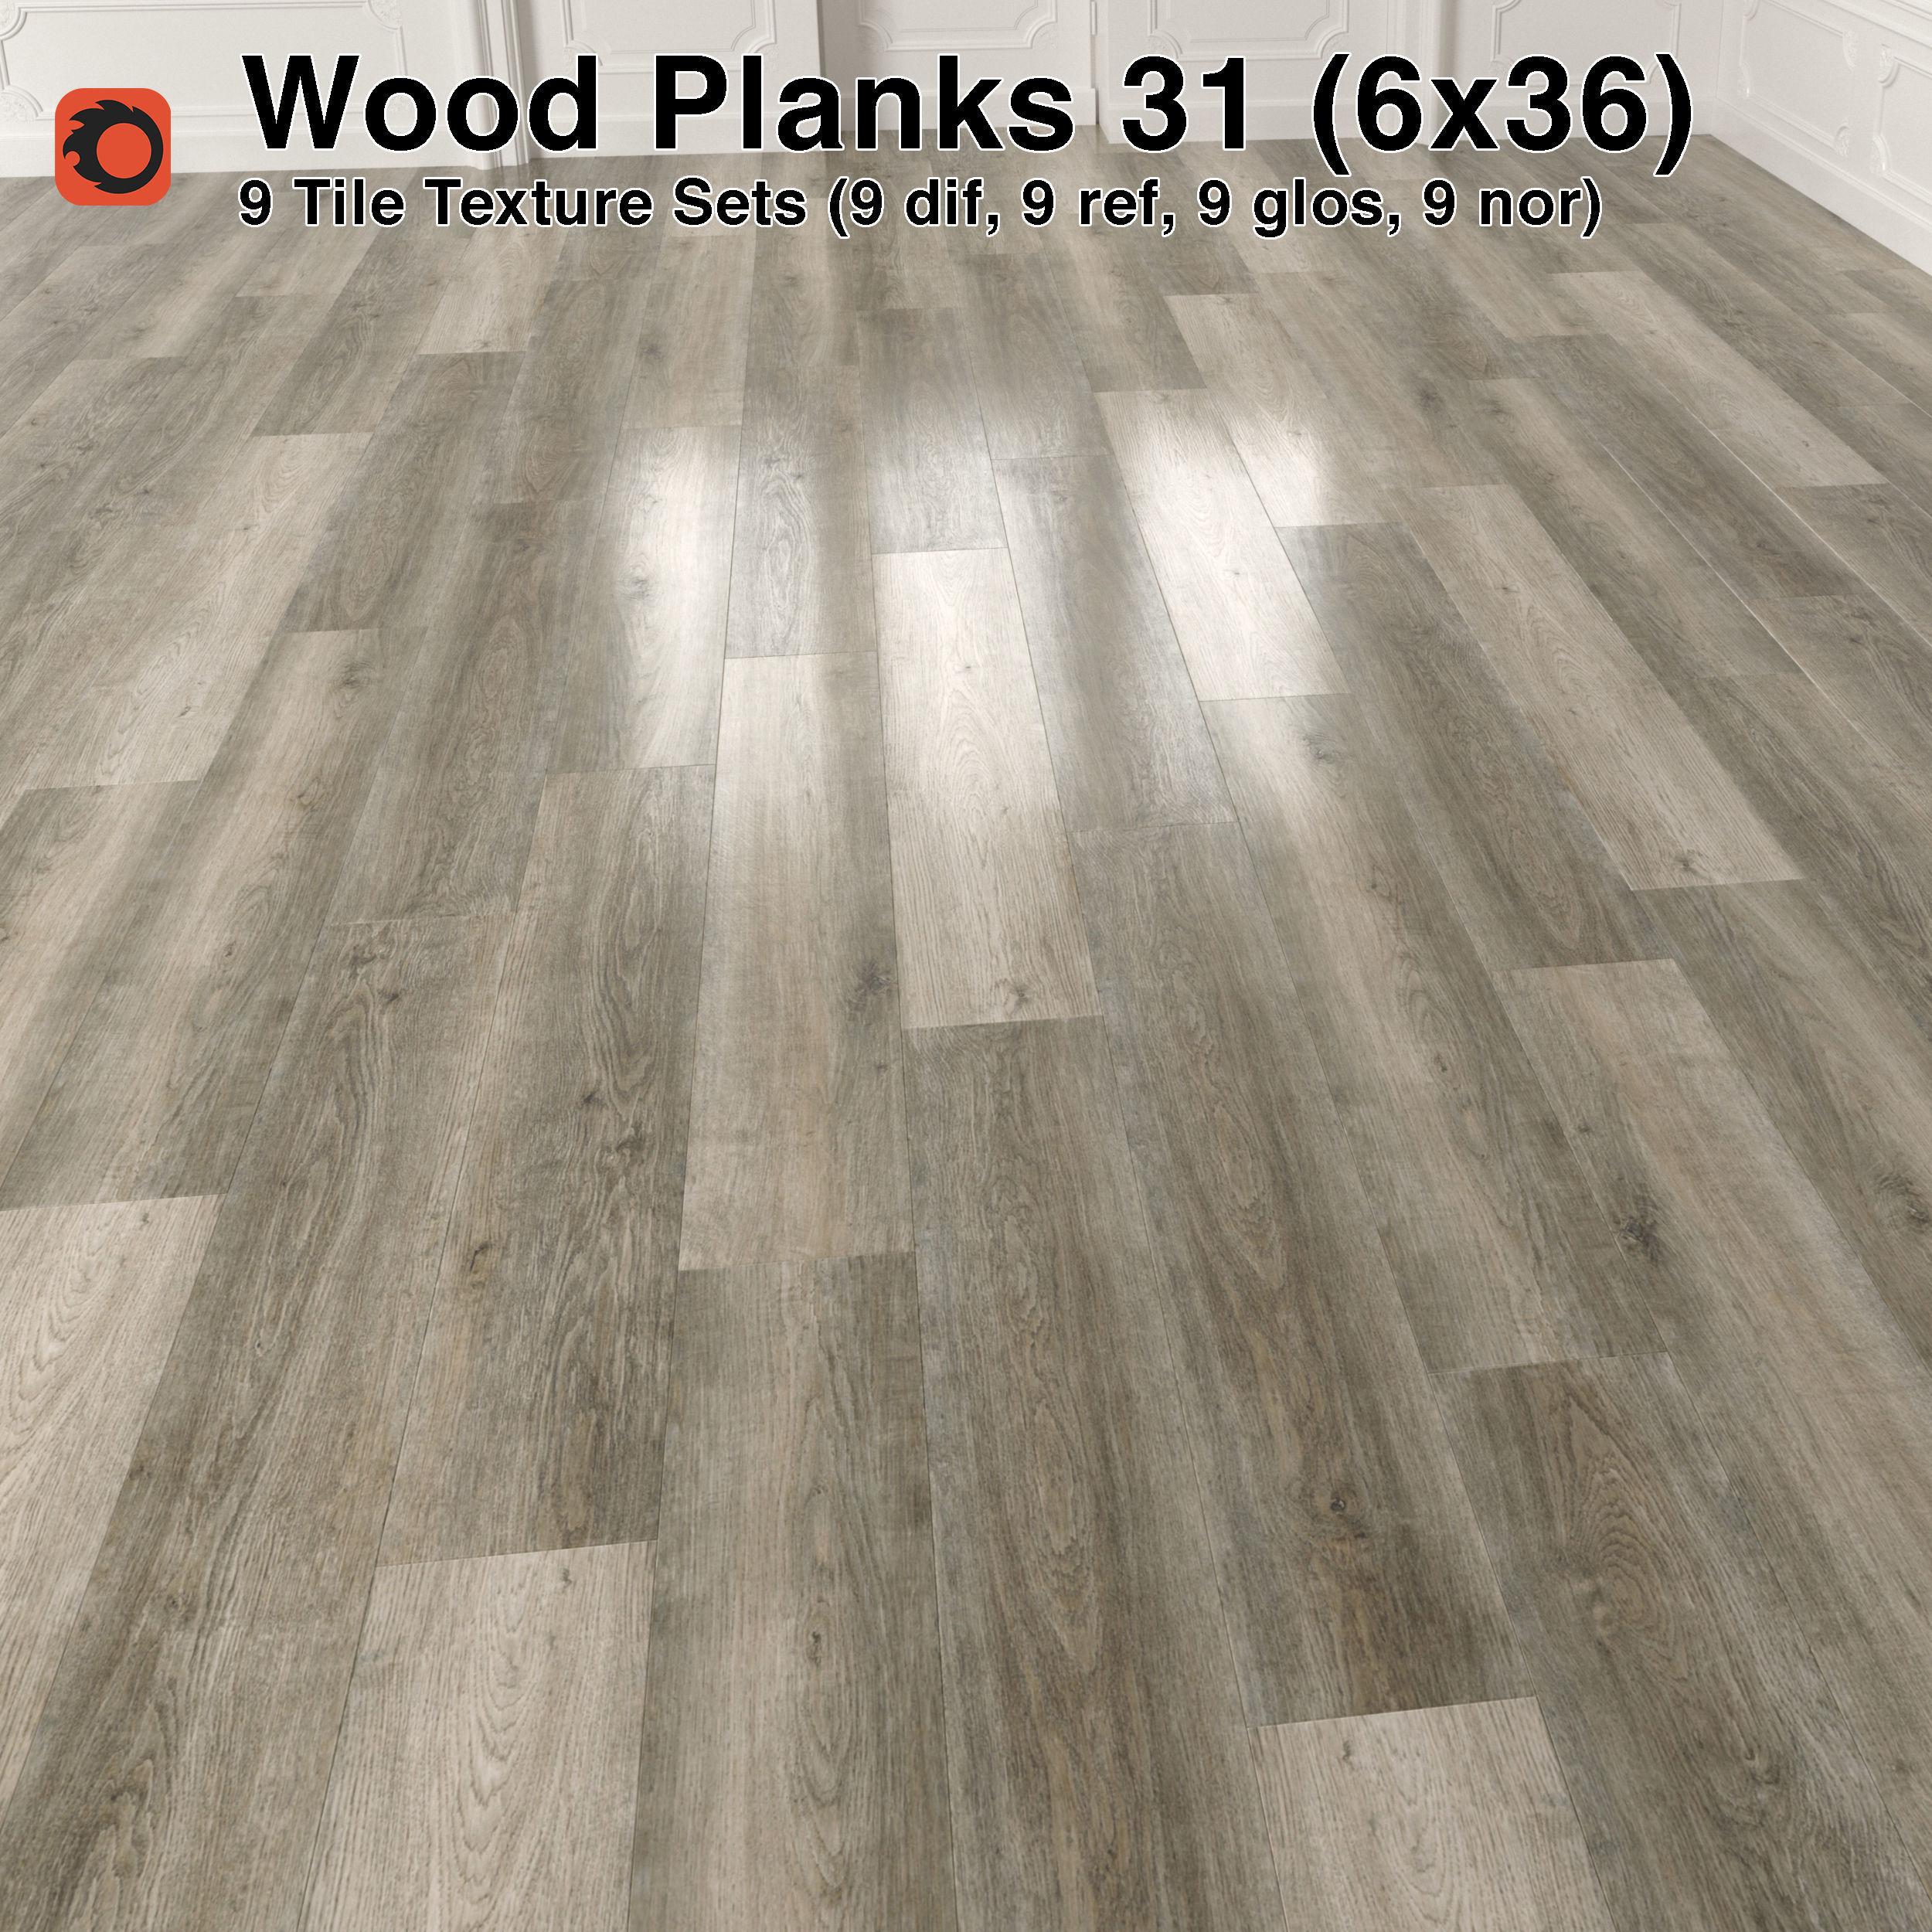 3d Wood Floor Planks Pack 31 Texture Cgtrader